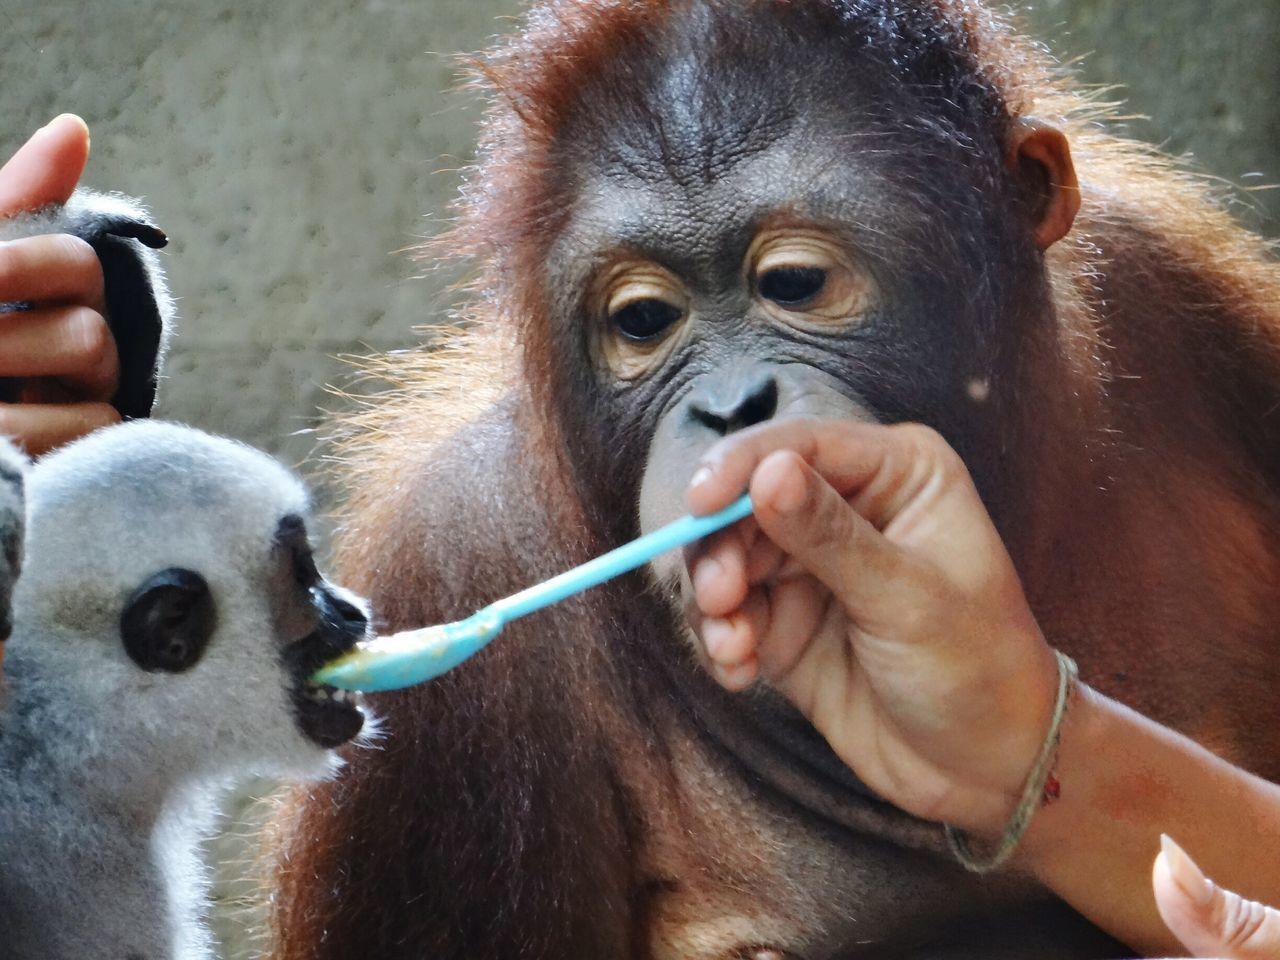 Bali, Indonesia Monkeys Monkey Eating Tiere Animal Animals Affen Zoo Feeding  Feeding Animals Feeding Monkeys Fütterung